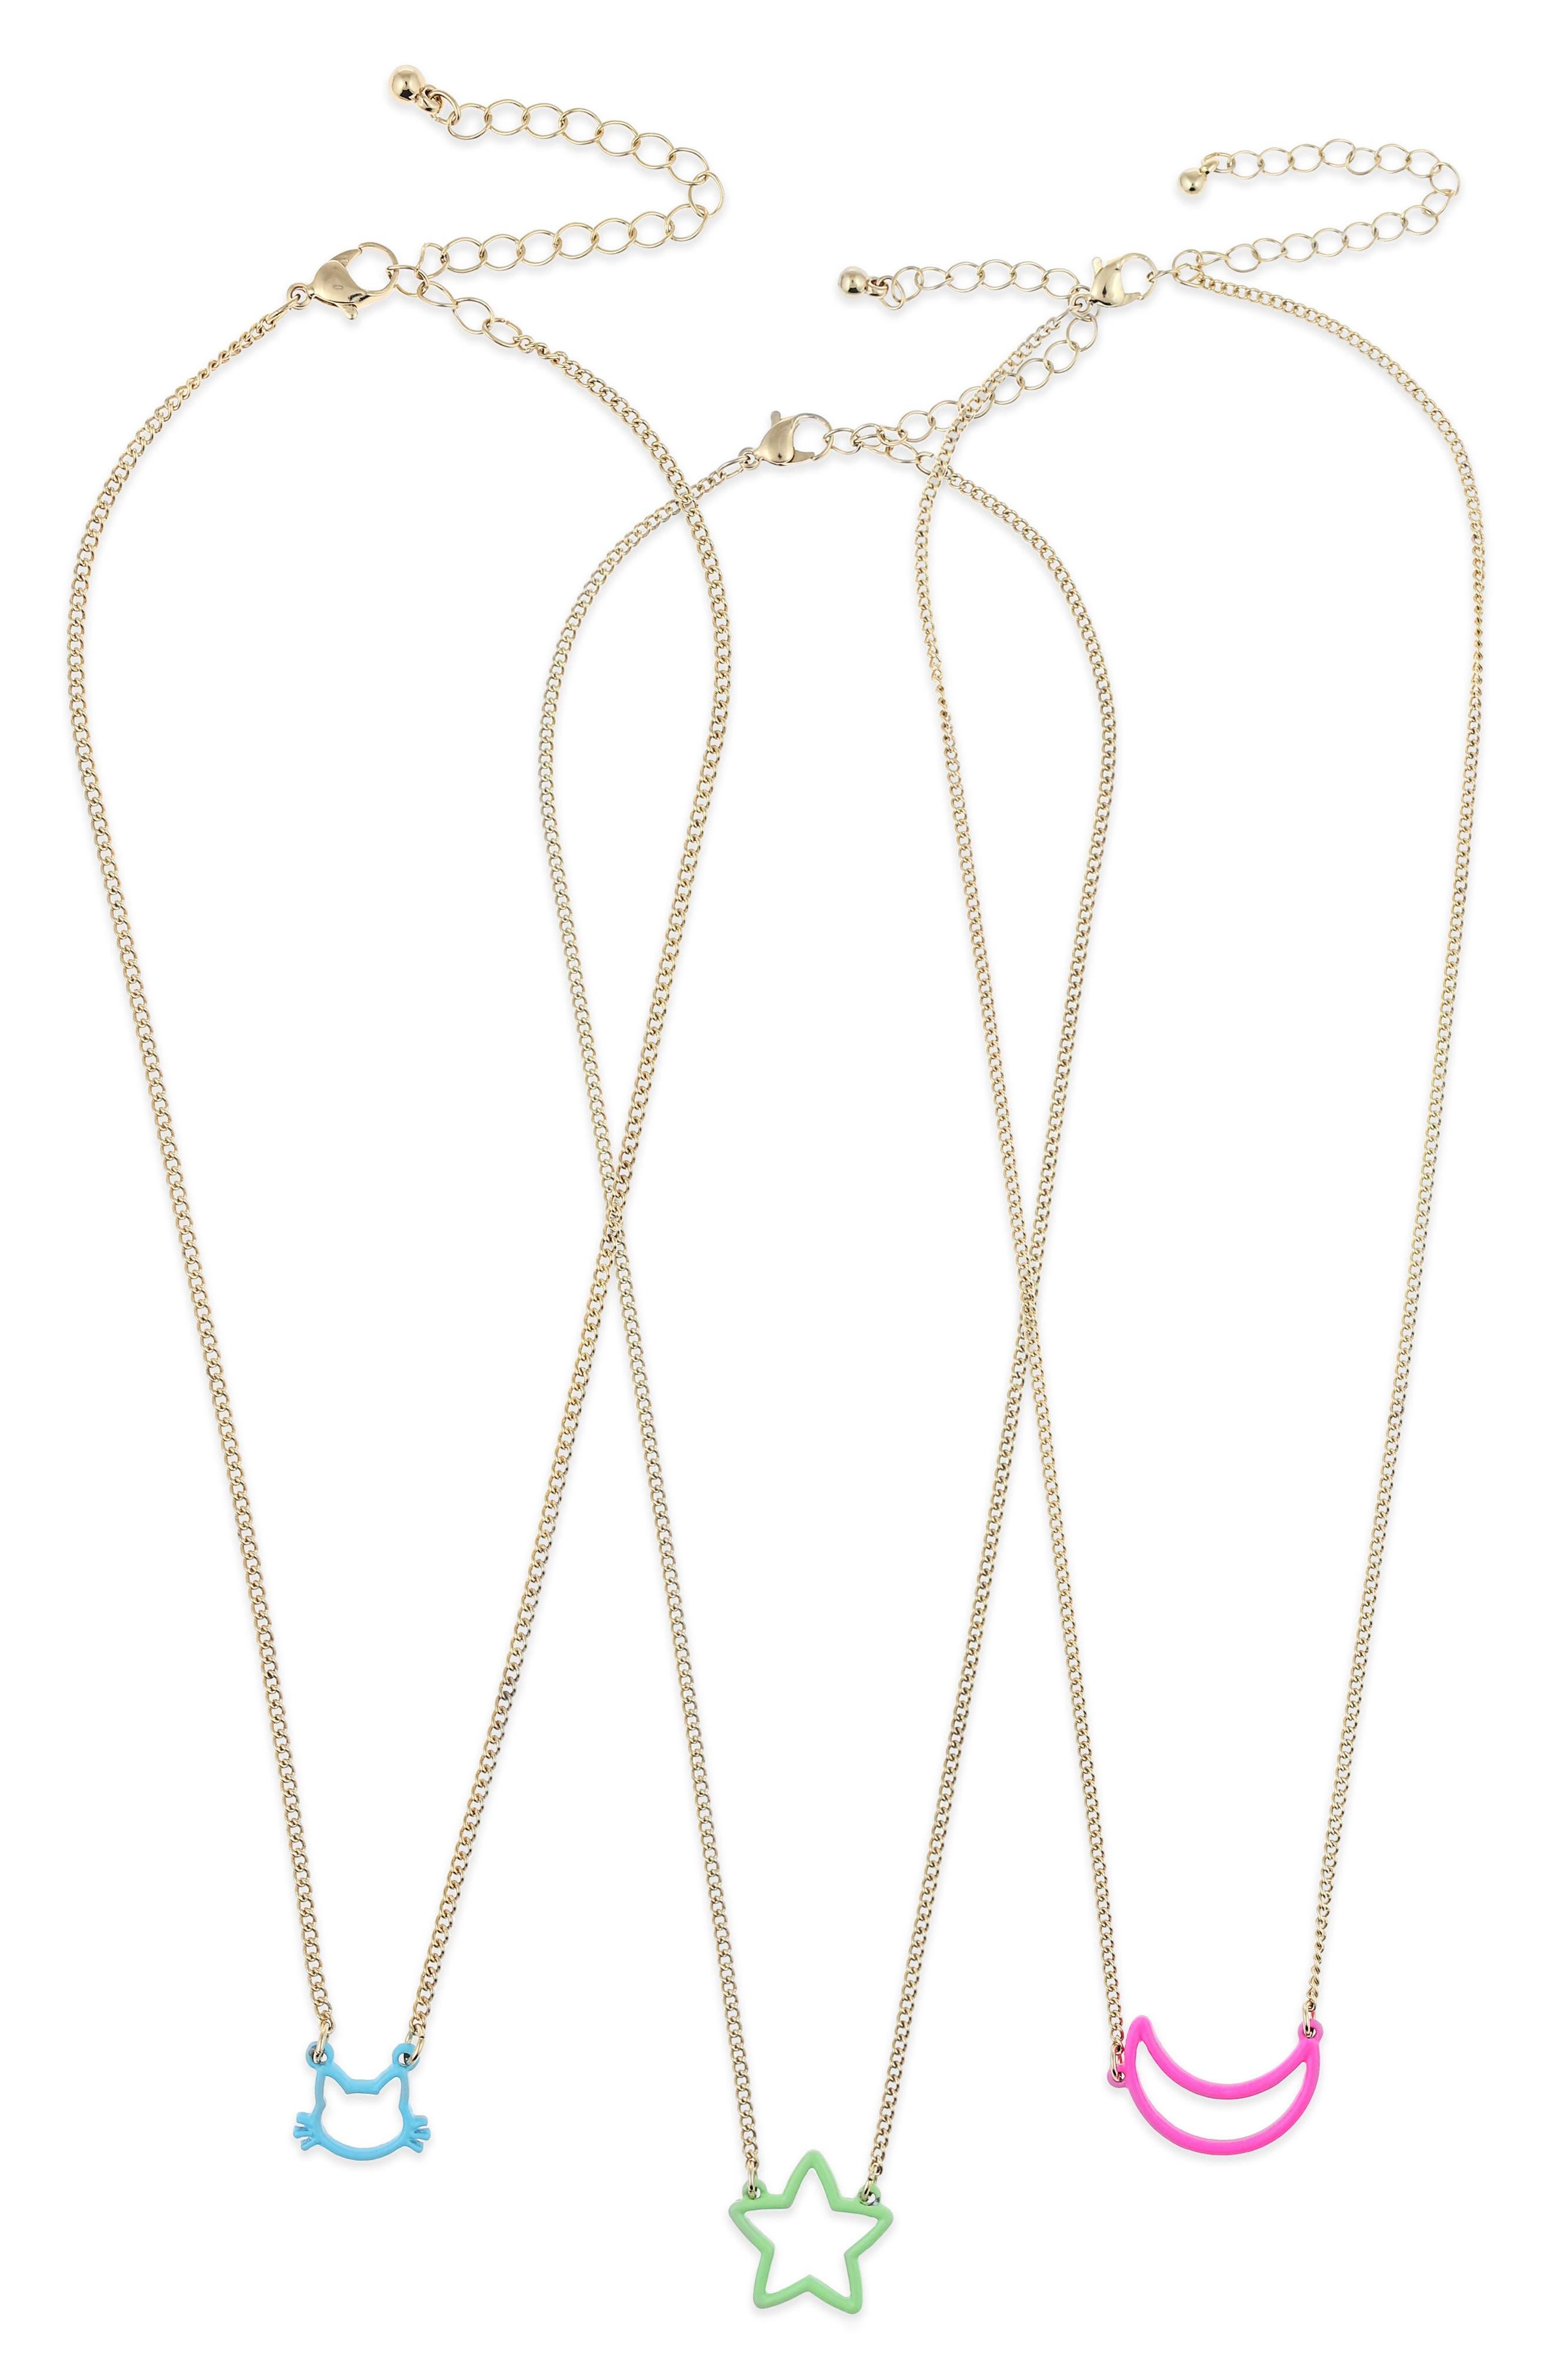 3-Pack BFF Necklace Set,                         Main,                         color, 711